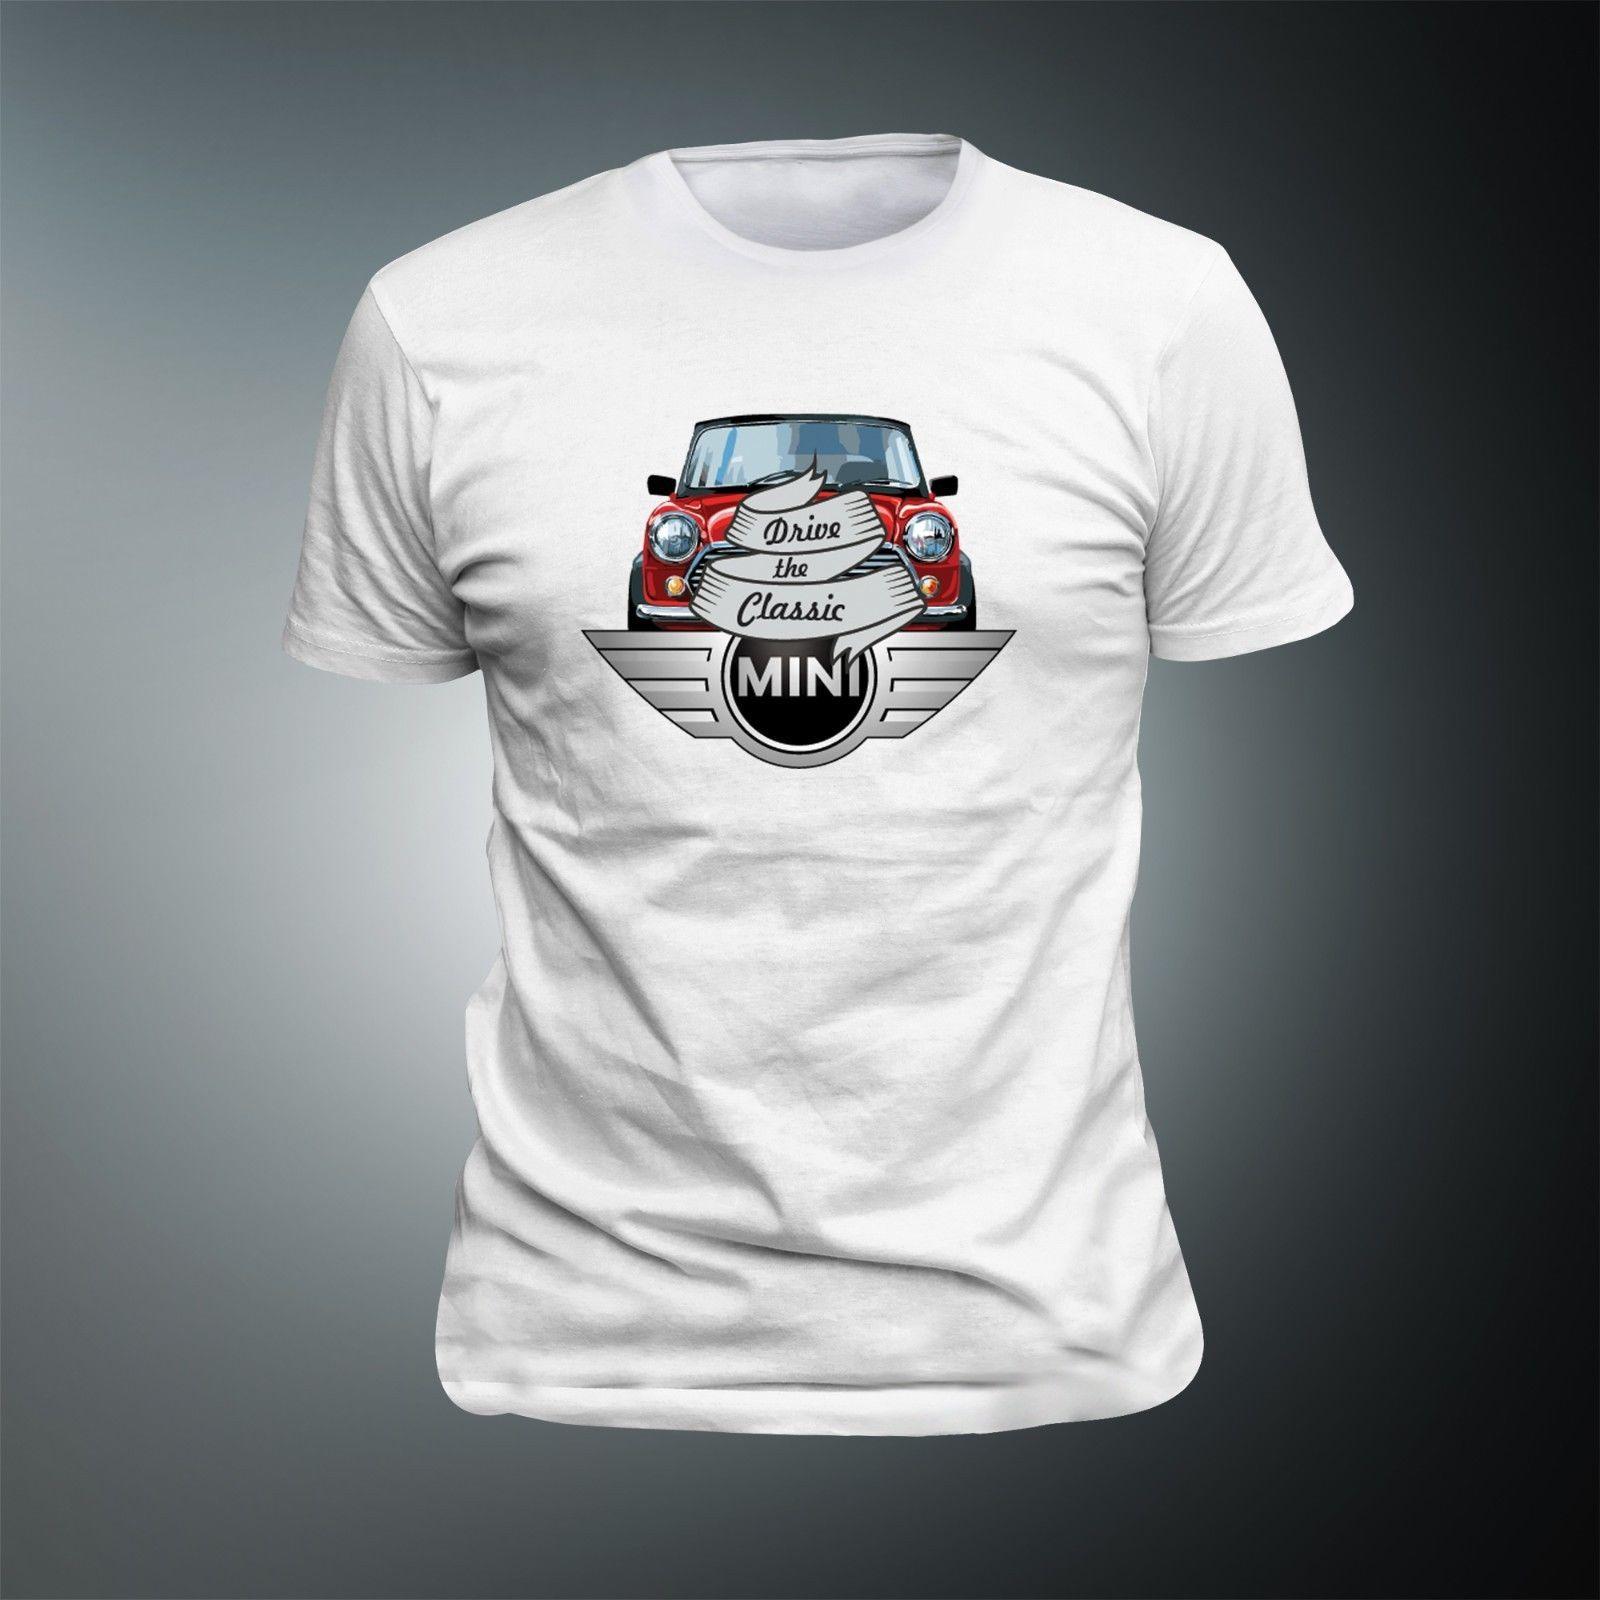 Großhandel 2018 Neu Sommer Cool T Shirt Deutschland Auto T Shirt ...